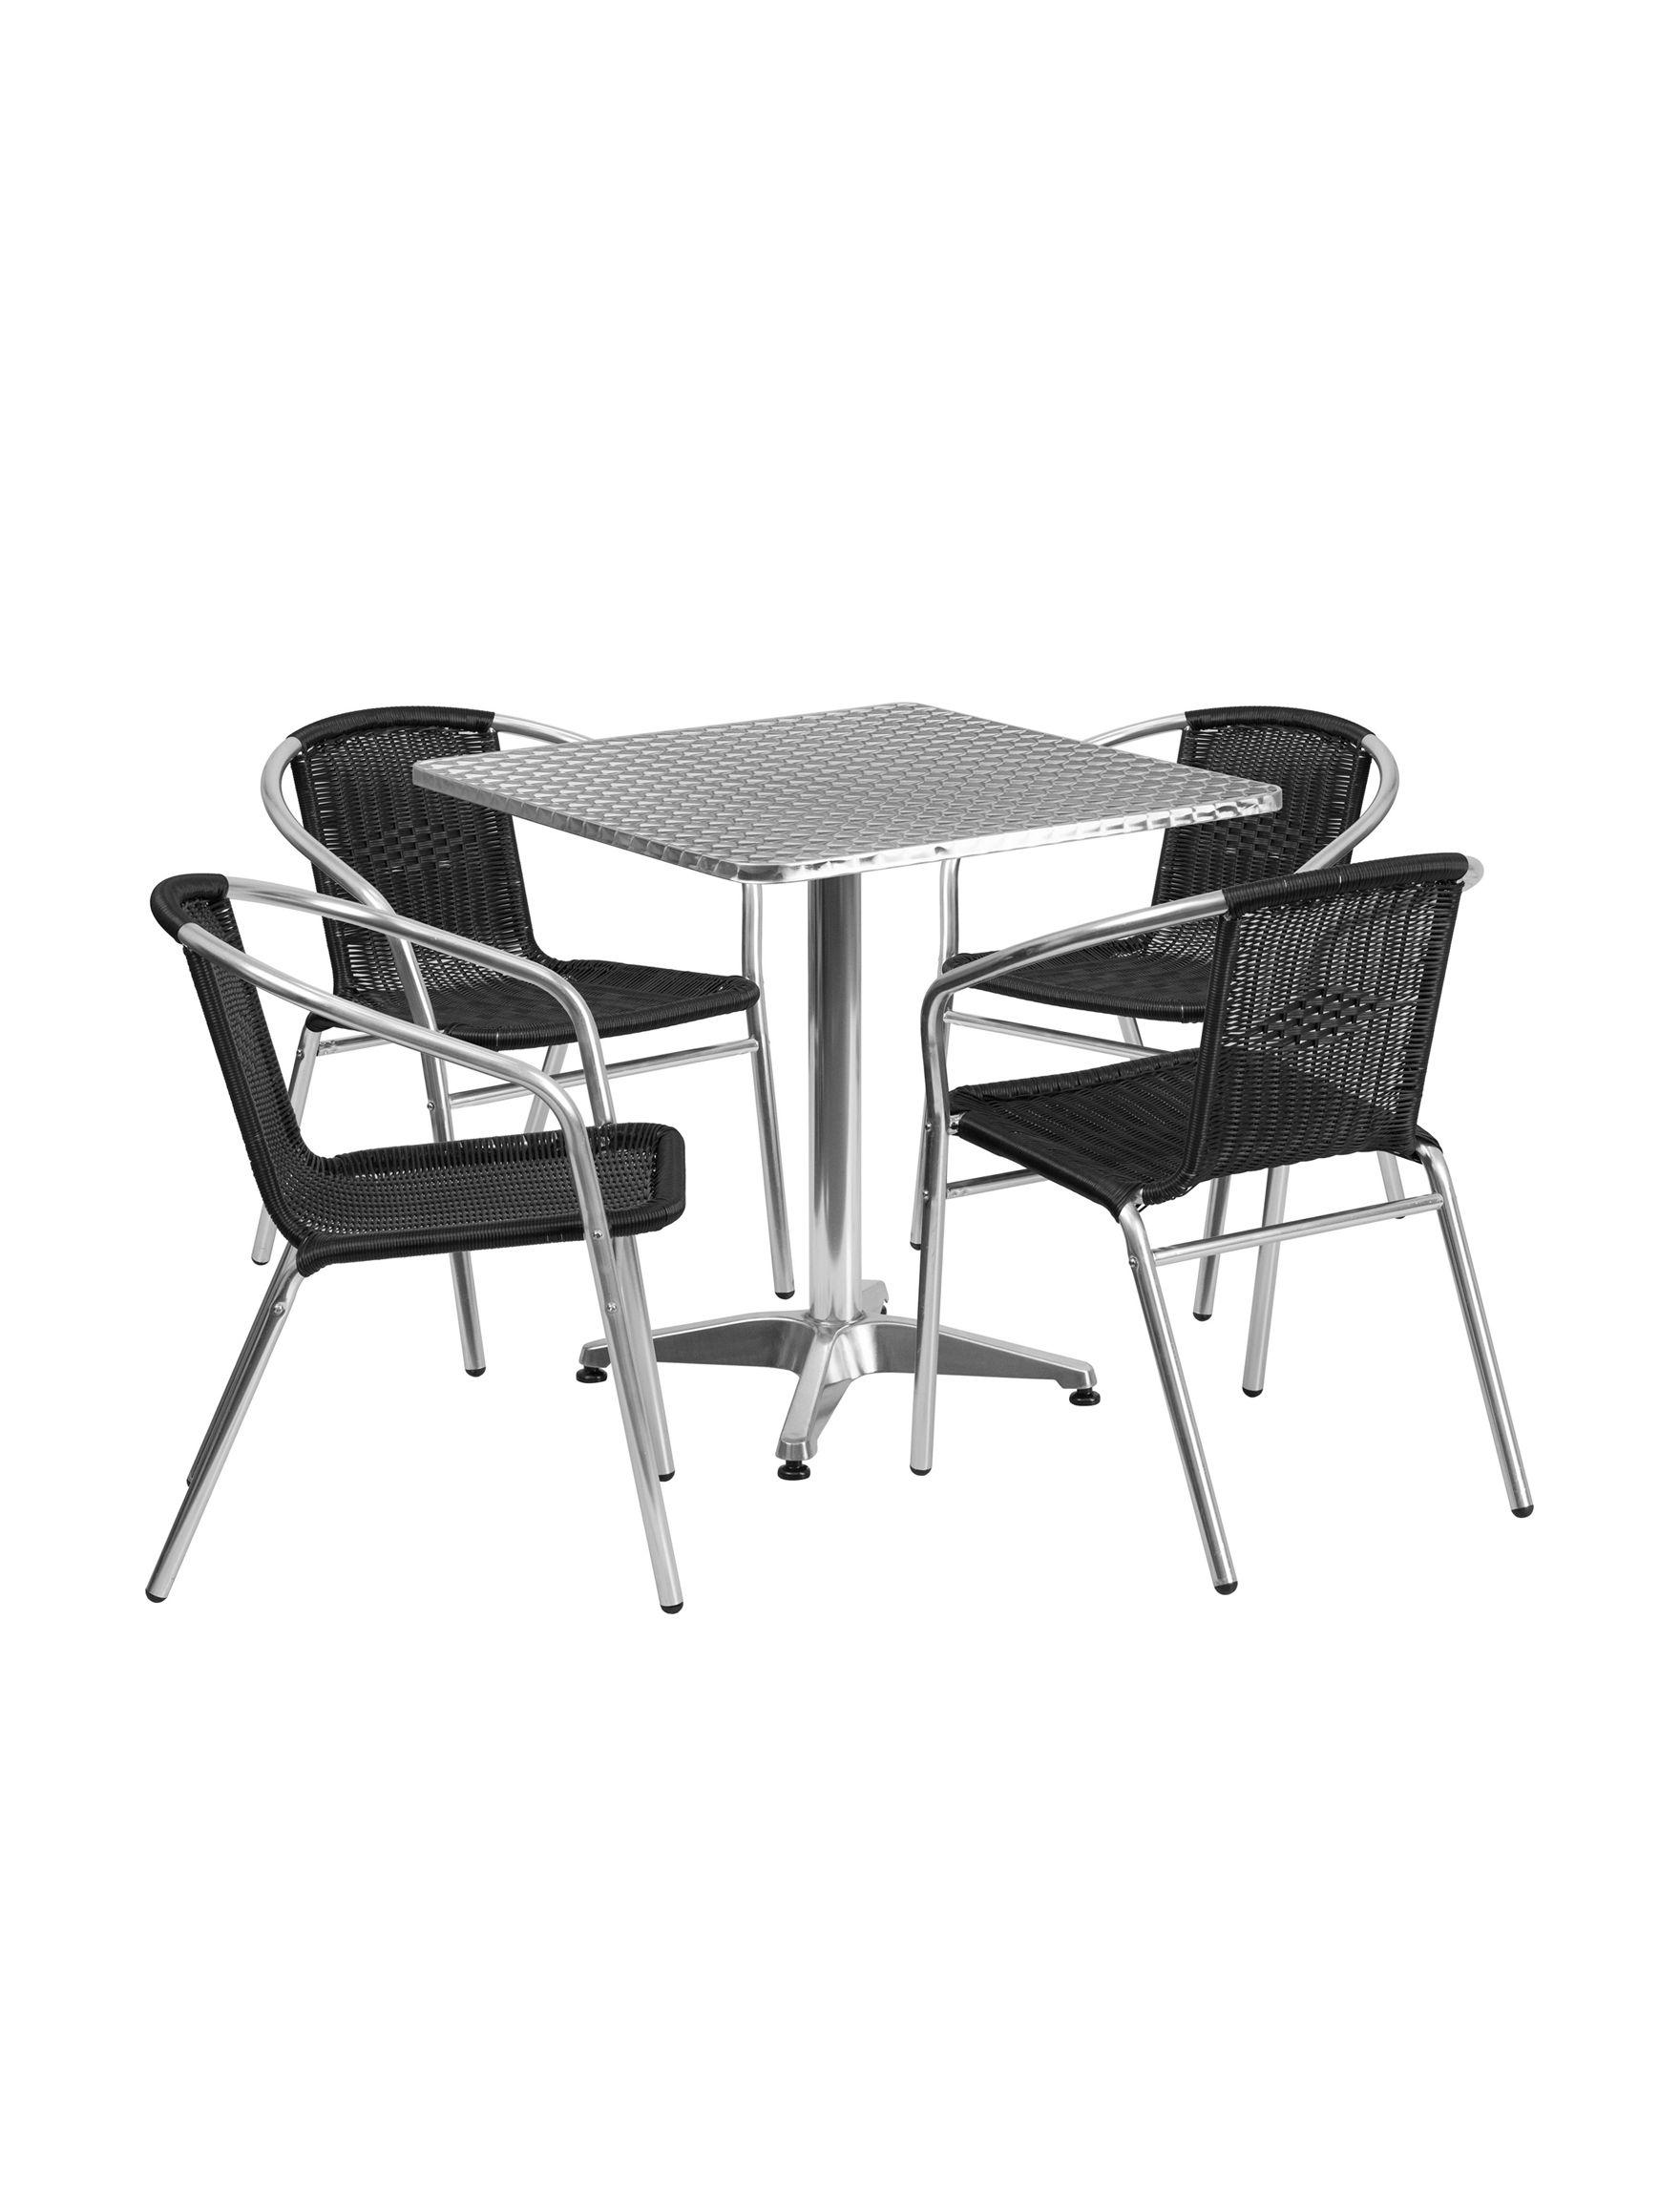 Flash Furniture Black Kitchen & Dining Furniture Patio & Outdoor Furniture